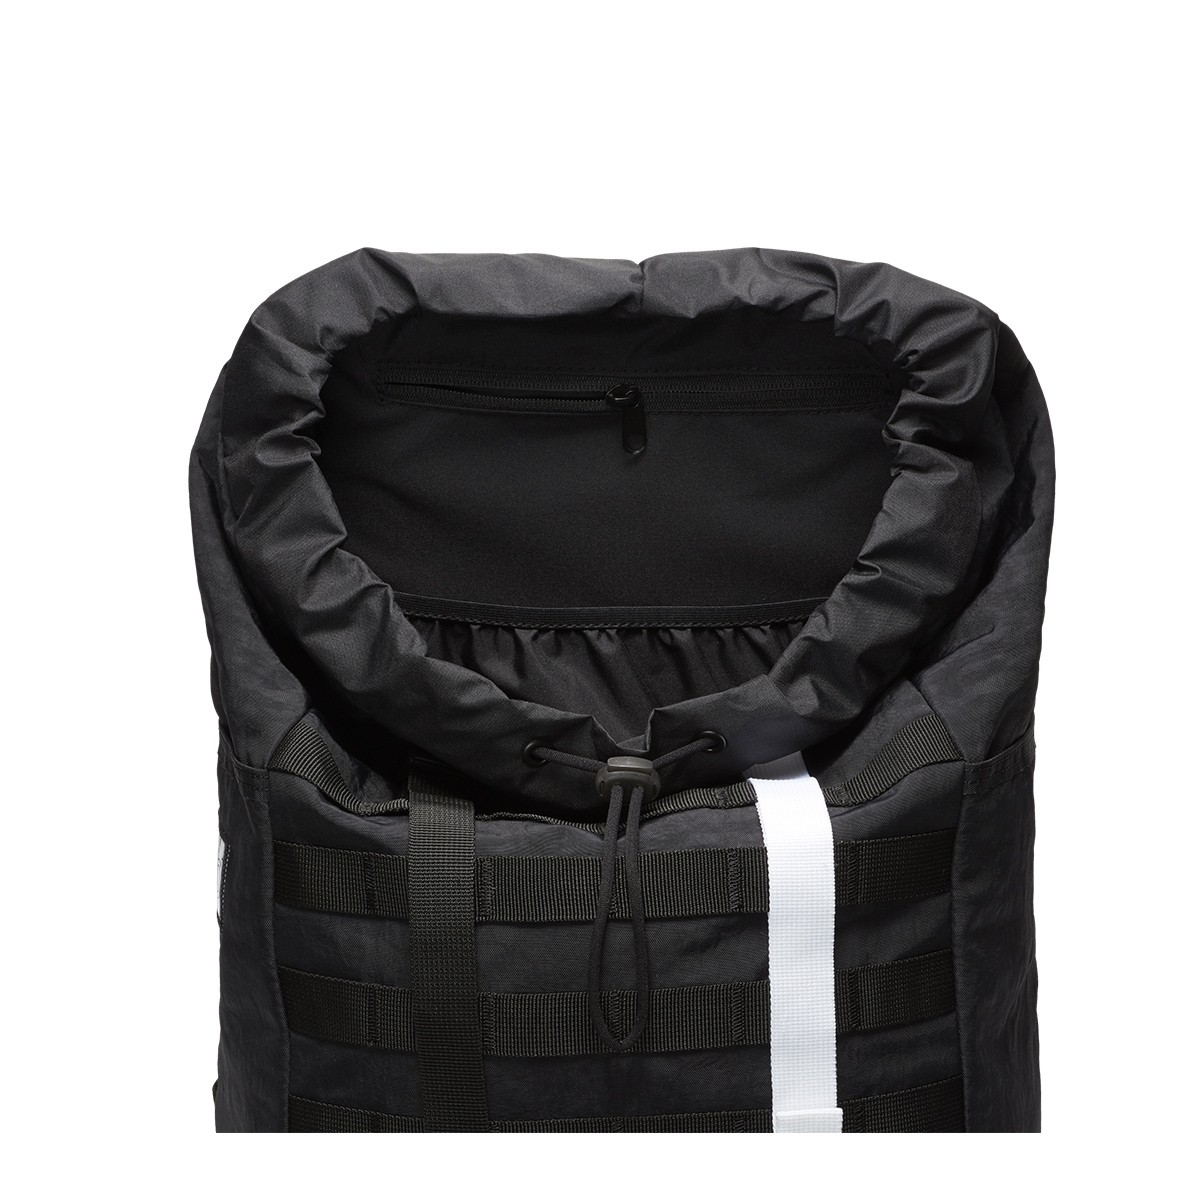 Nike Backpack 'Kevin Durant'-CK1925-010